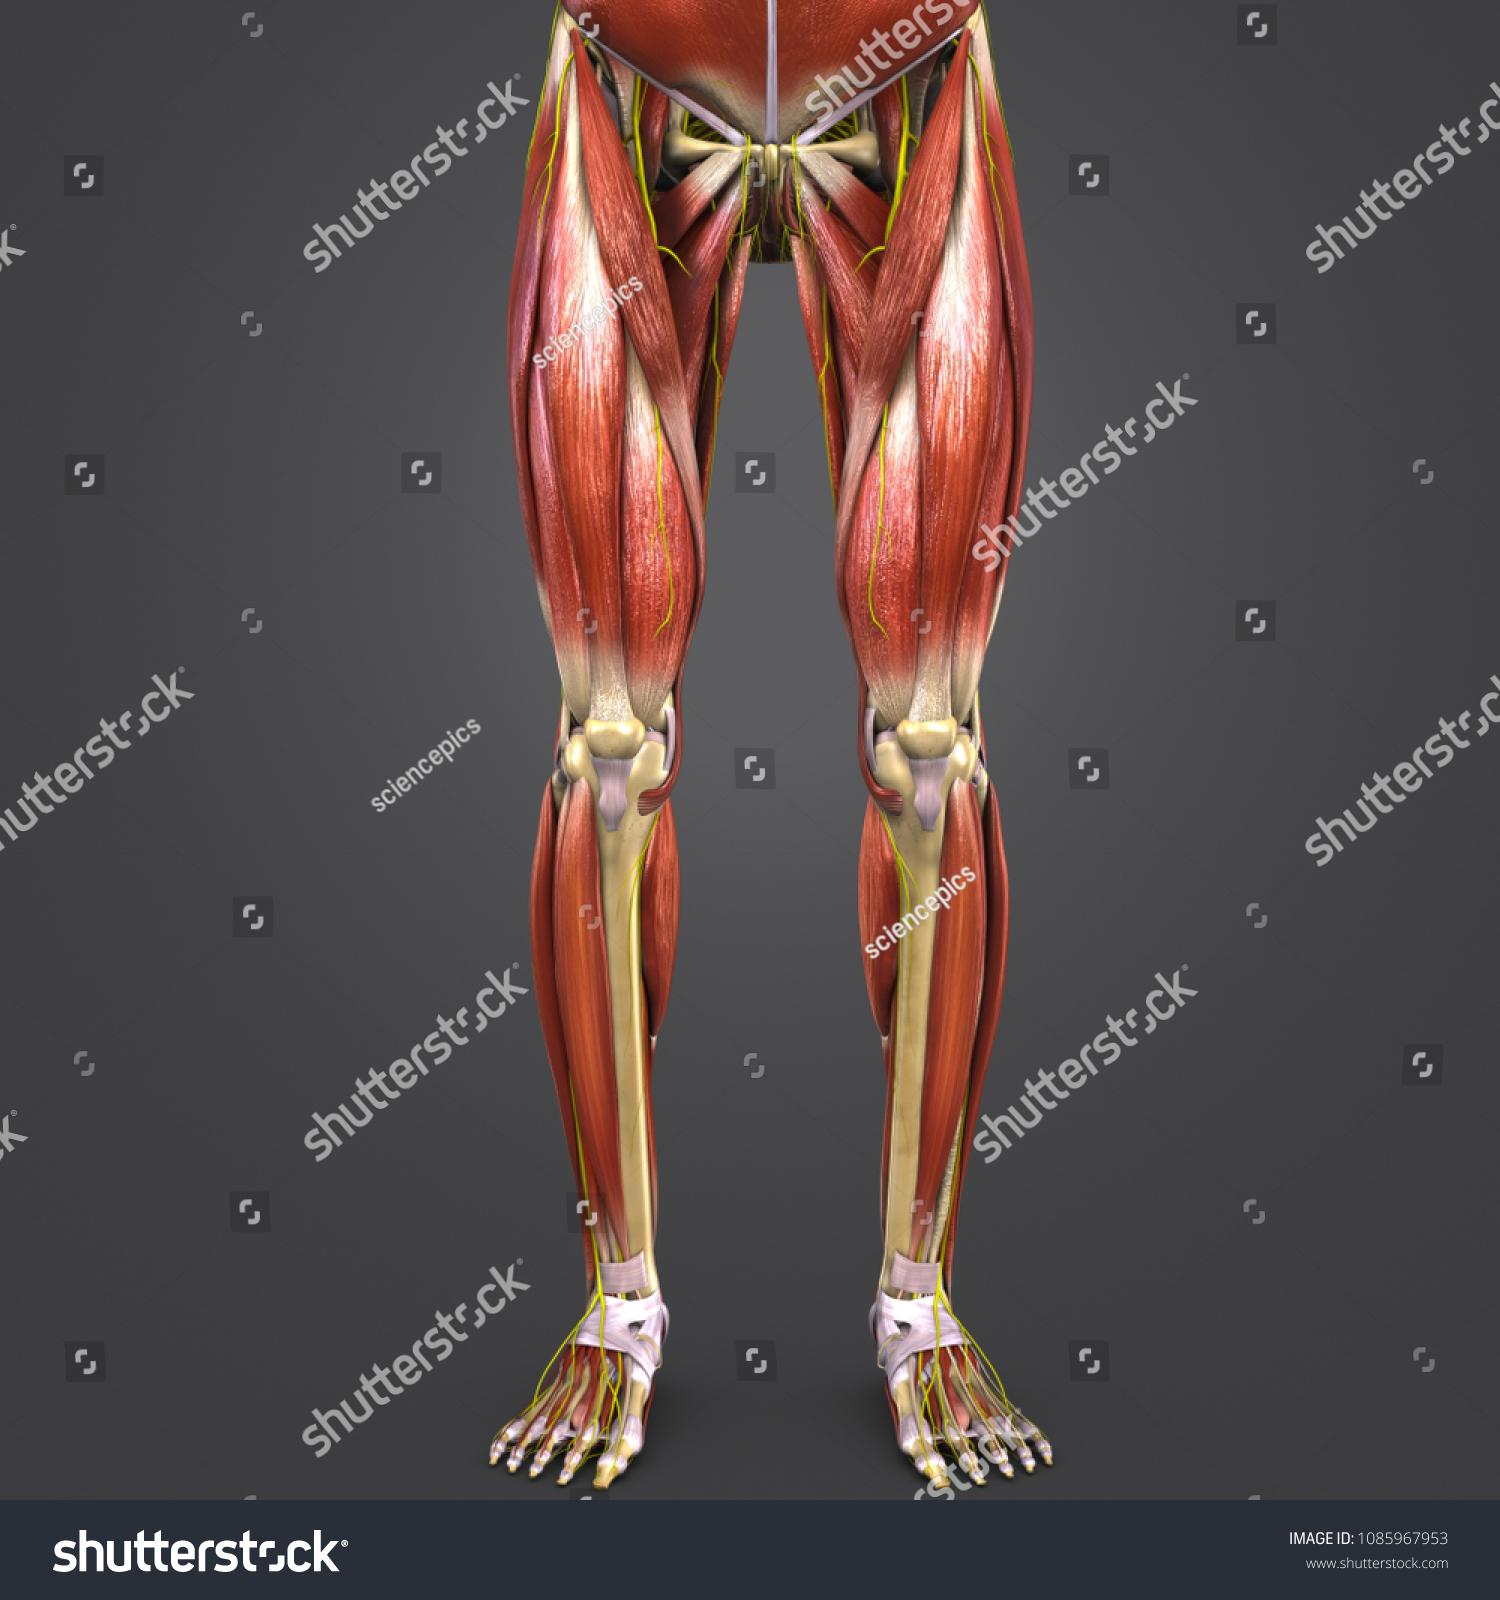 Lower Limbs Muscle Anatomy Skeleton Nerves Stock Illustration ...